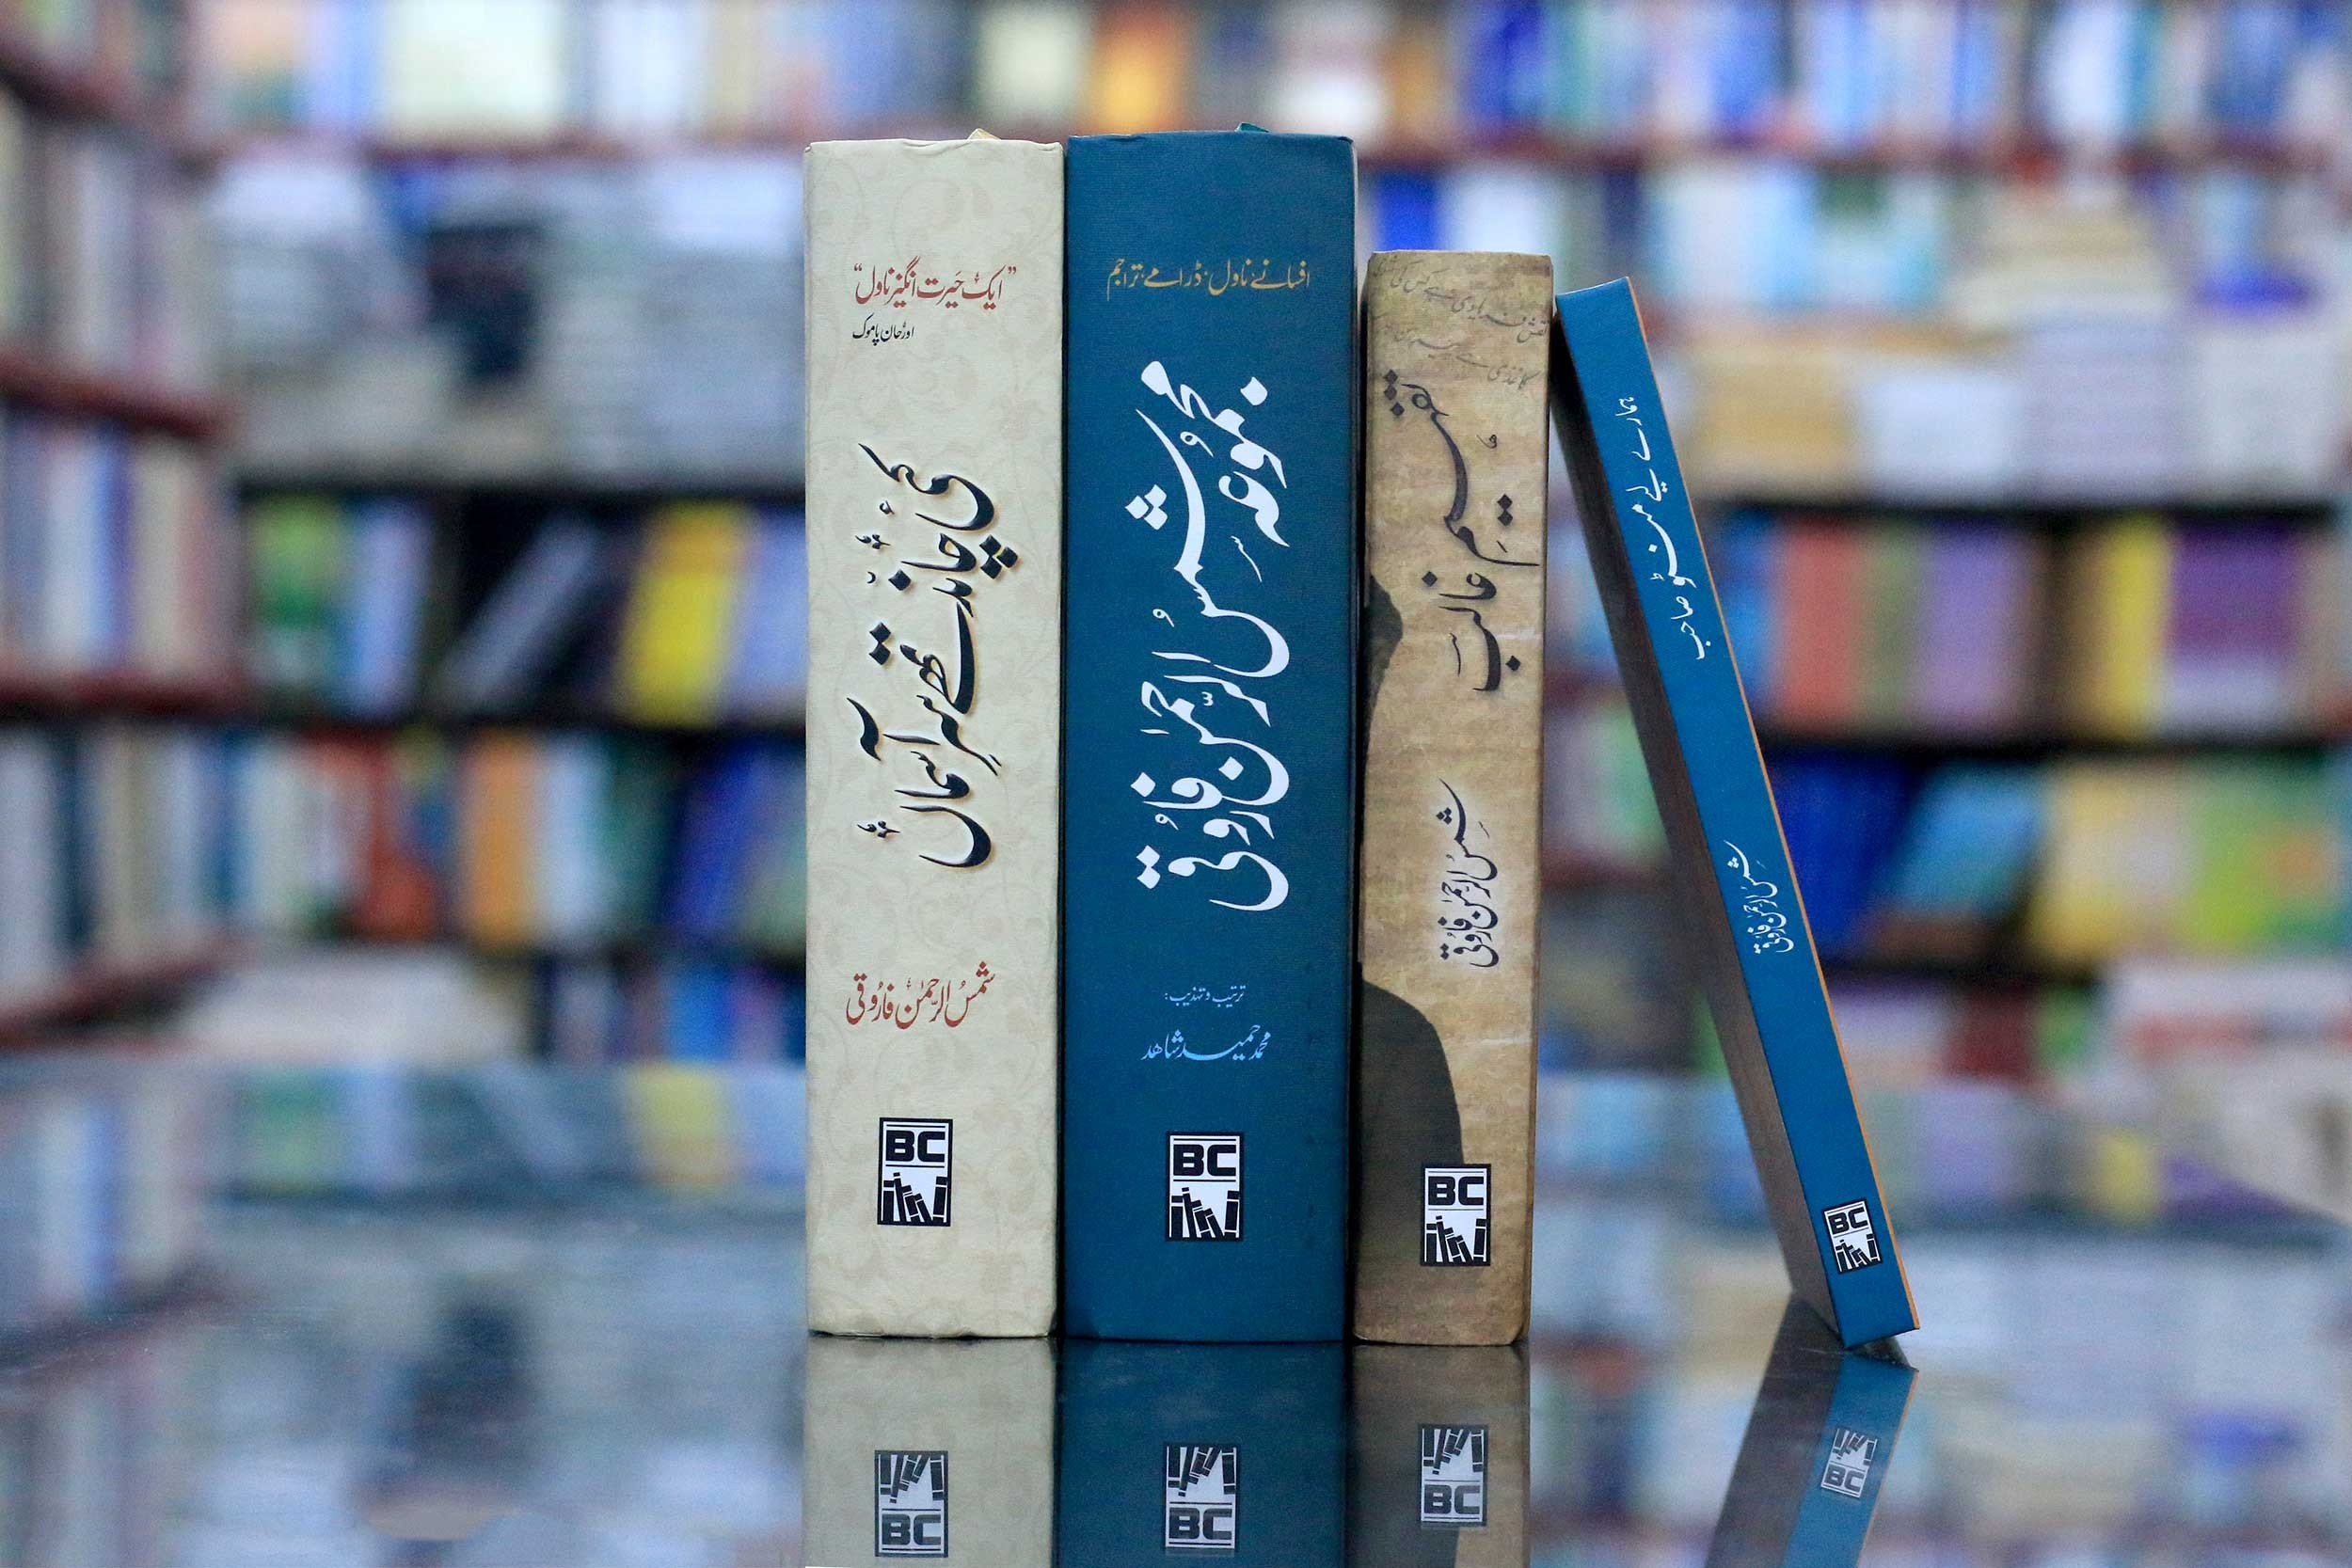 SHAMSUR RAHMAN FARUQI | 4 BOOKS | BUNDLE OFFER